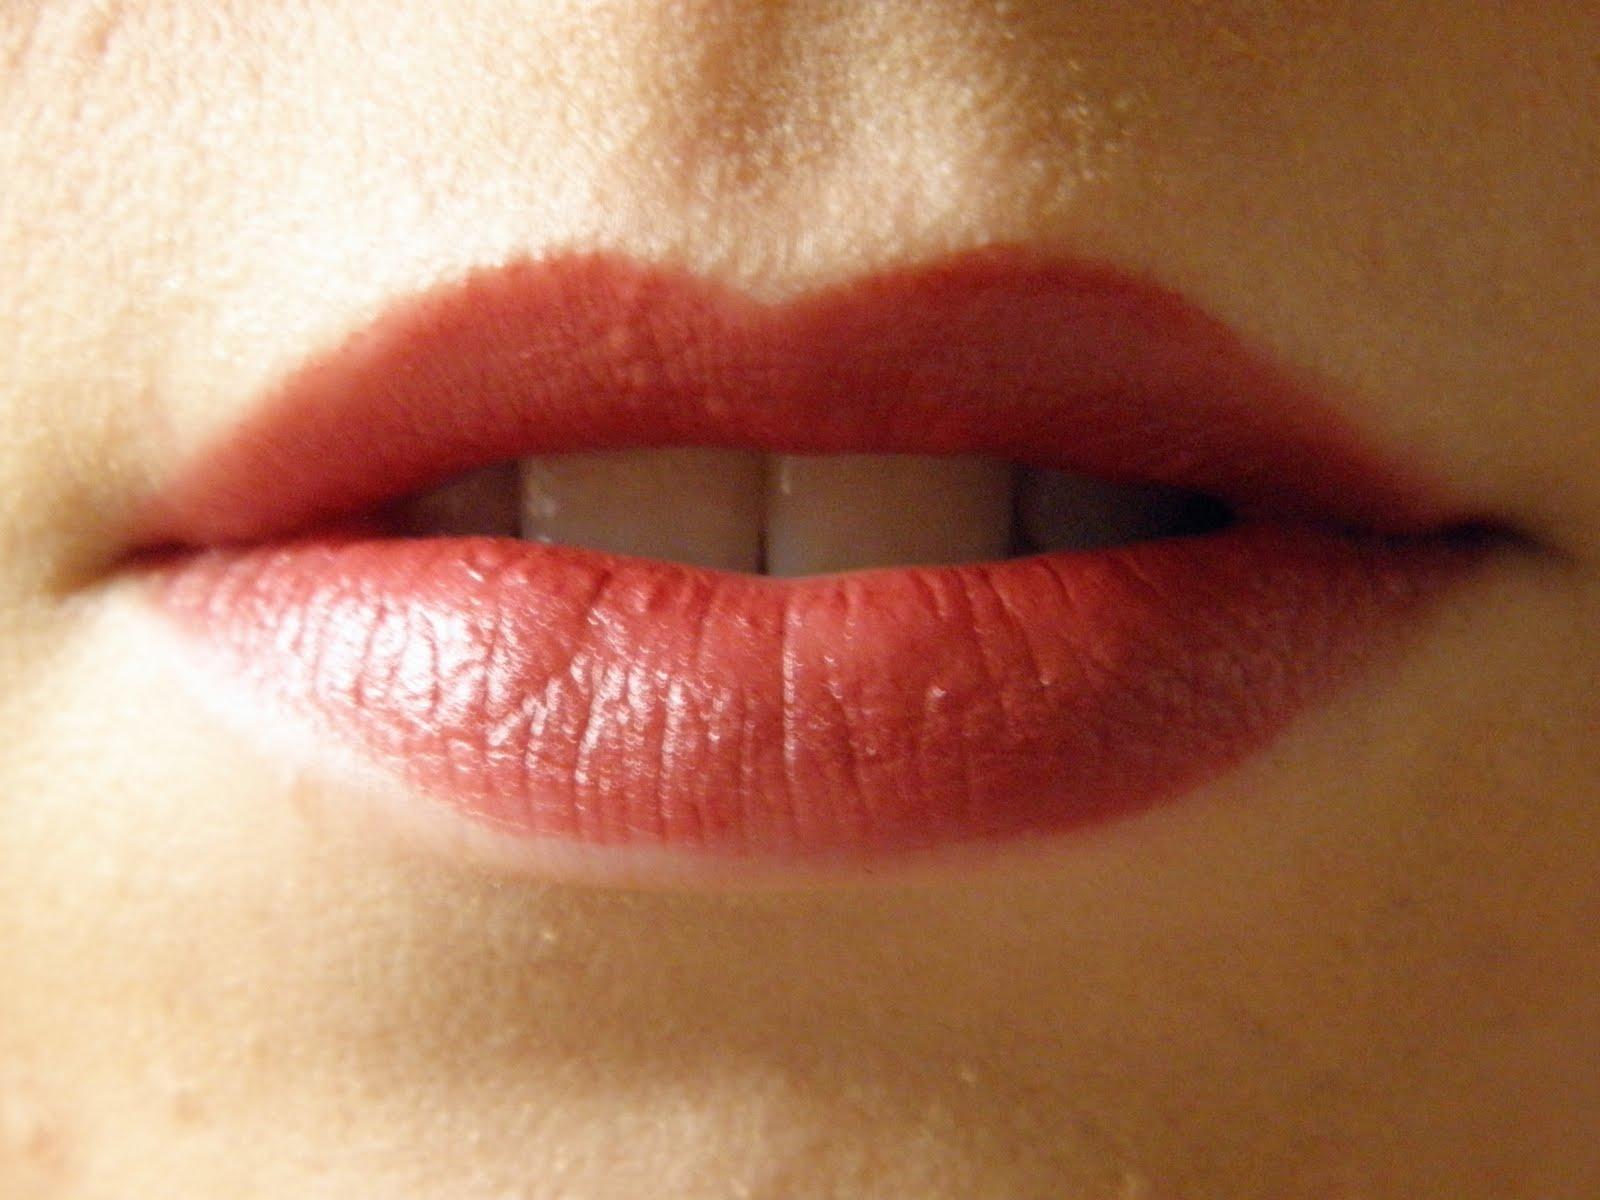 http://2.bp.blogspot.com/-jPK4hyyZD3k/Tj21Y-1m3cI/AAAAAAAAAOw/bM7H9sW5lYQ/s1600/P7220125.JPG